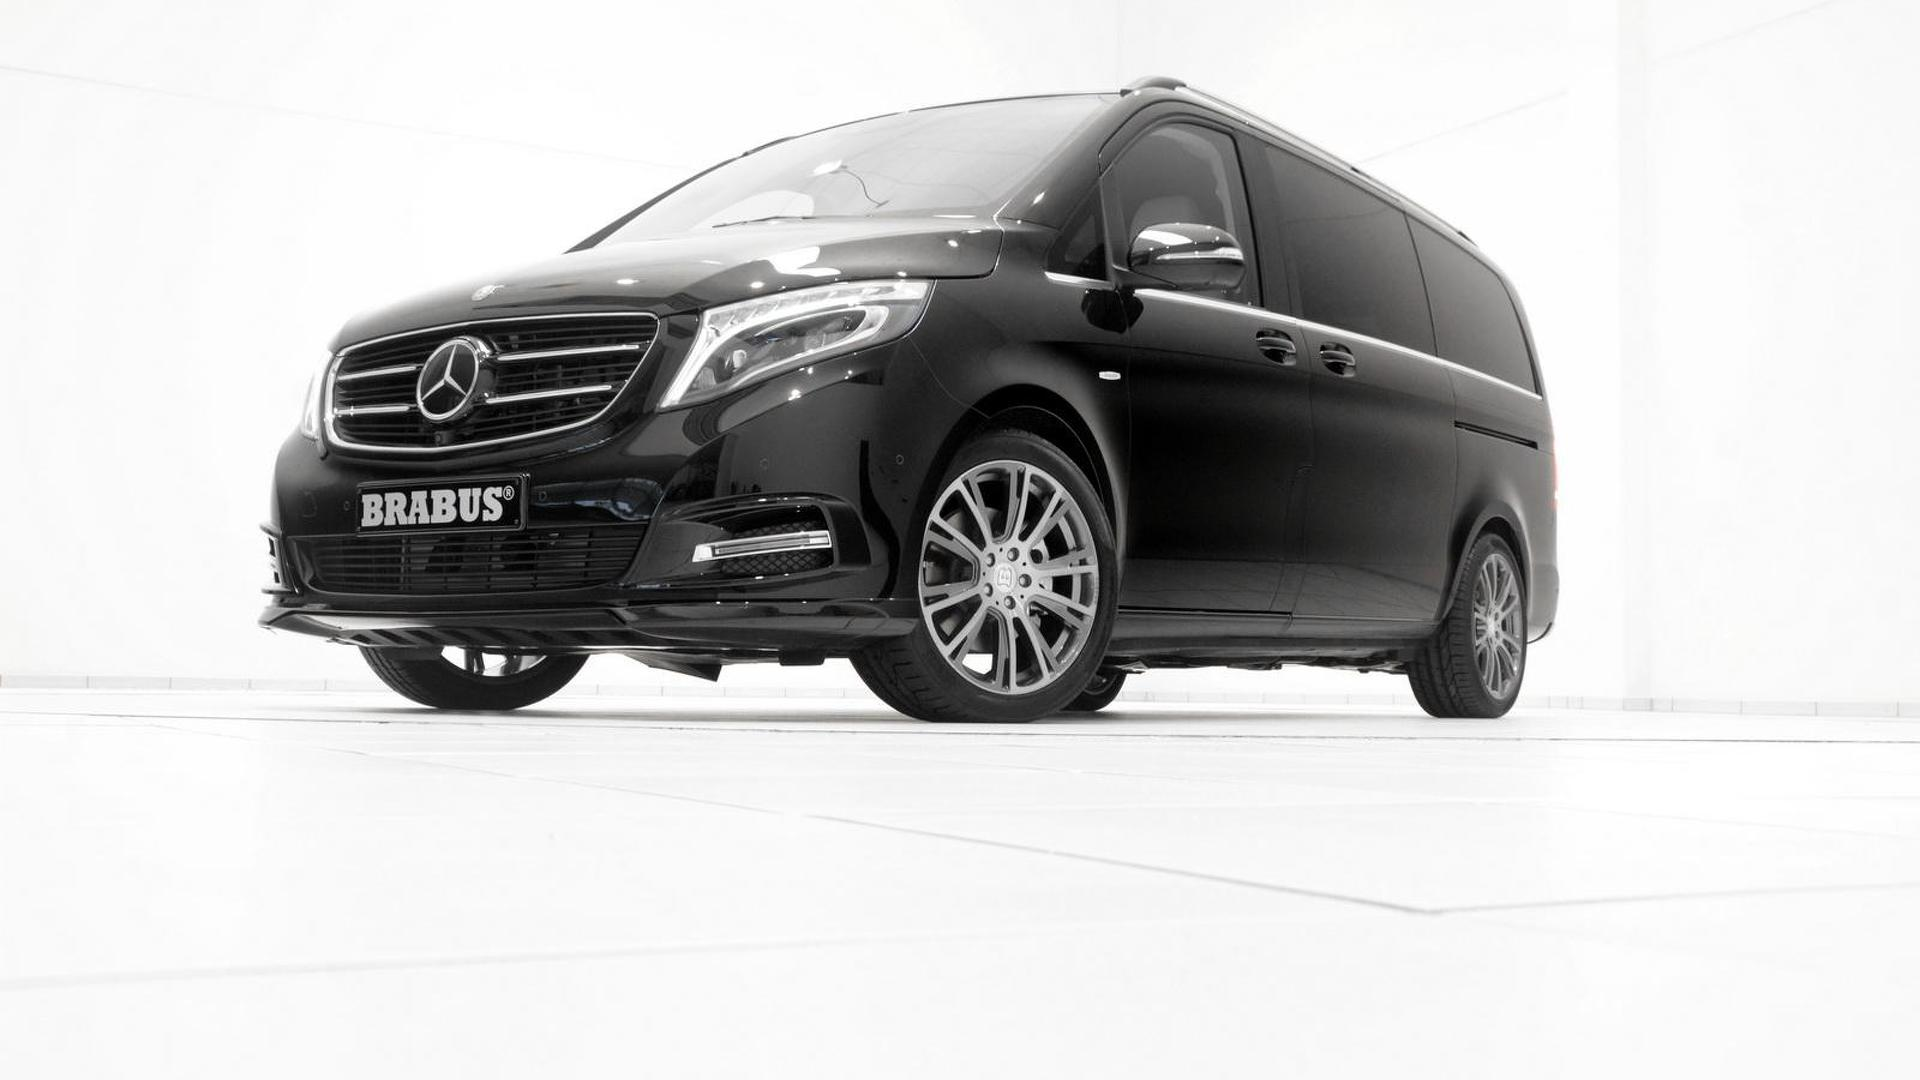 Brabus tunes the Mercedes V-Class